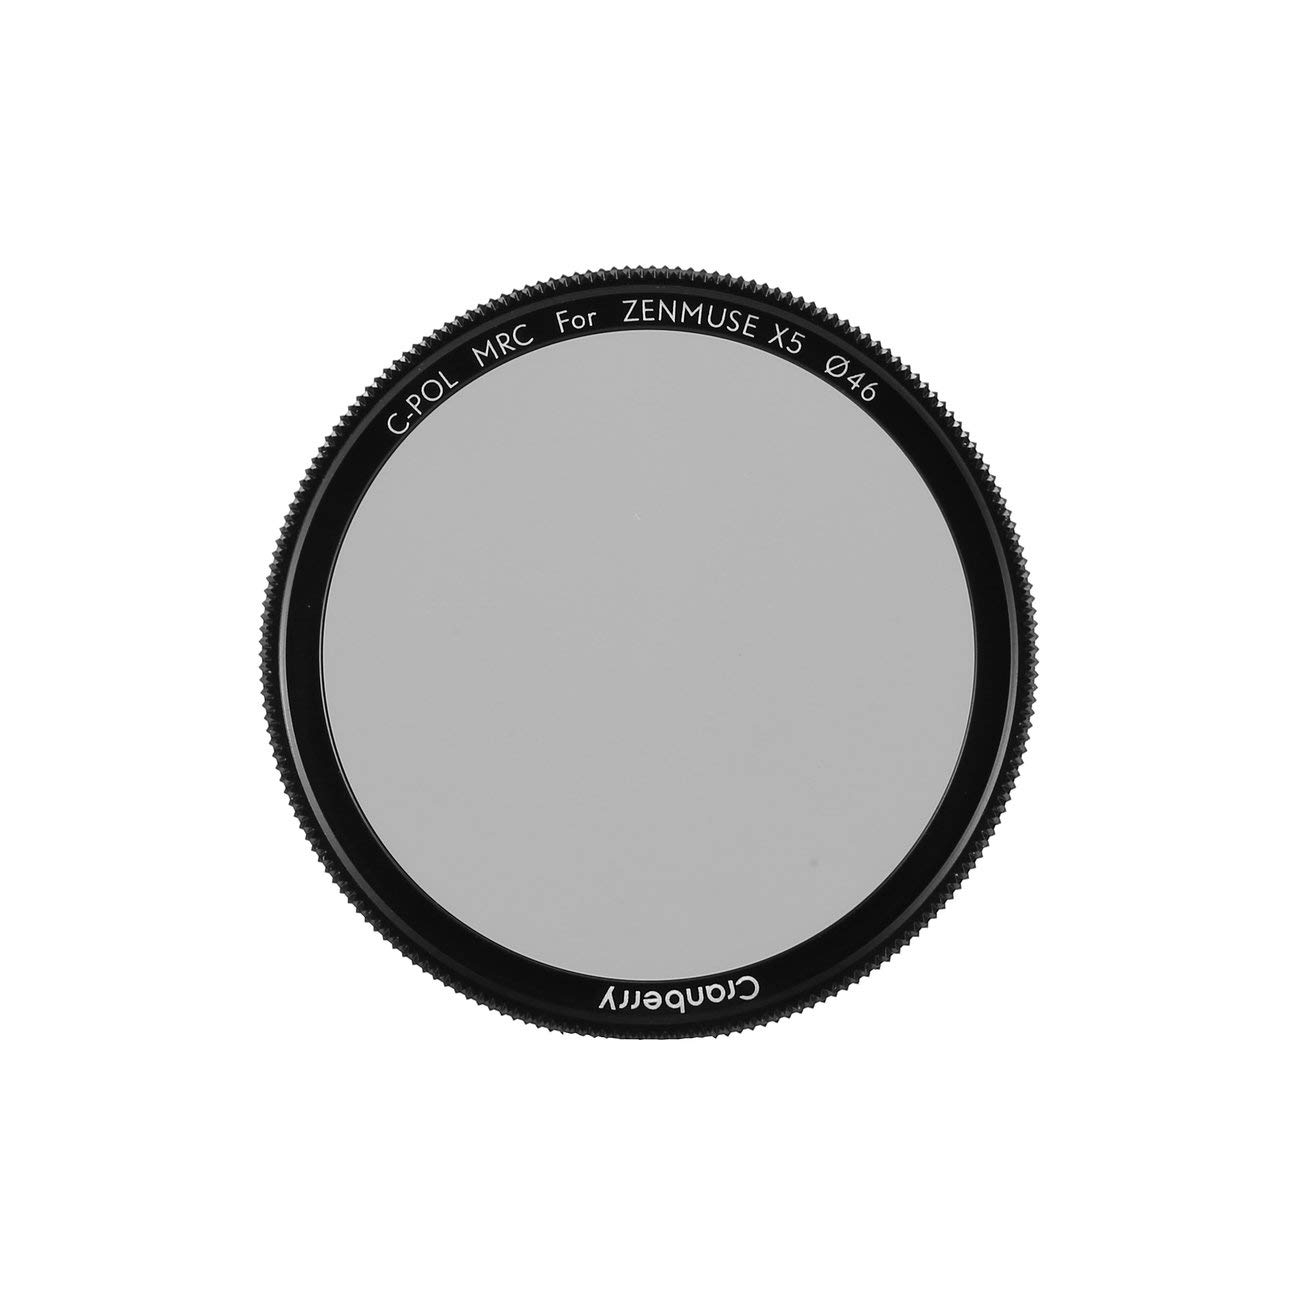 Portable Light Lens Filter CPL HD Camera Lens Filter DJI Zenmuse X5/X5S Jiobapiongxin